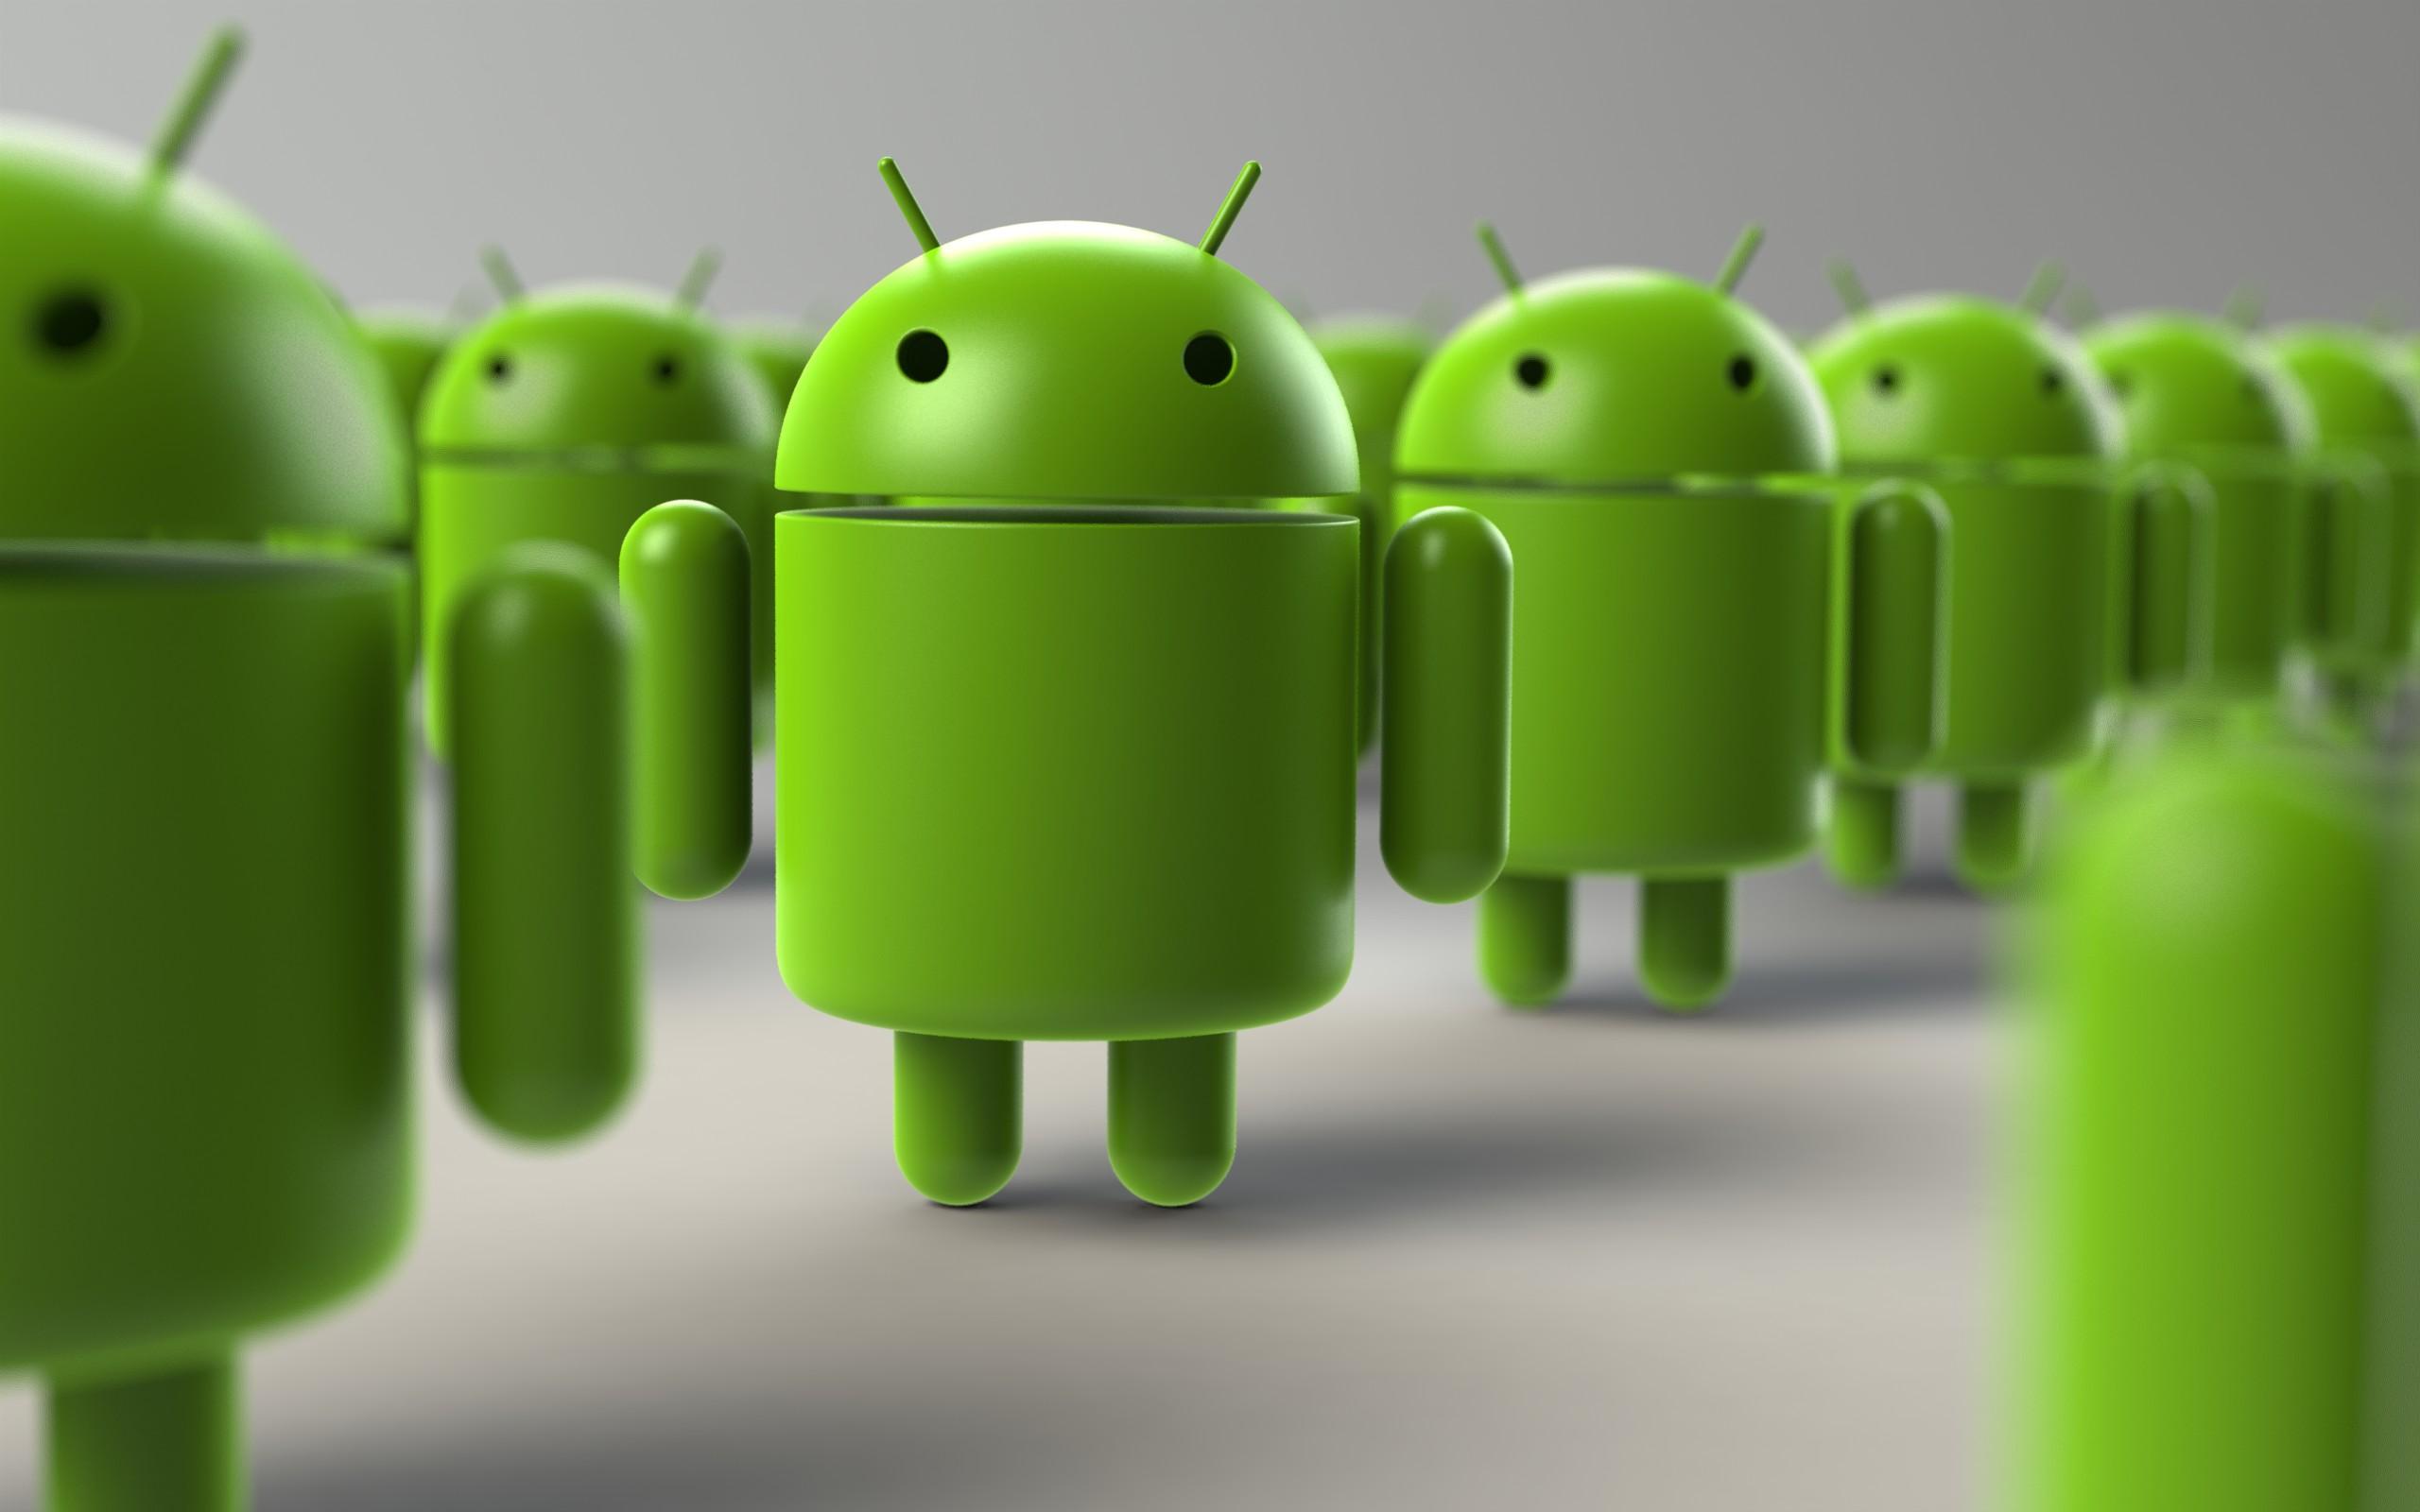 Картинки для андроида на рабочий стол